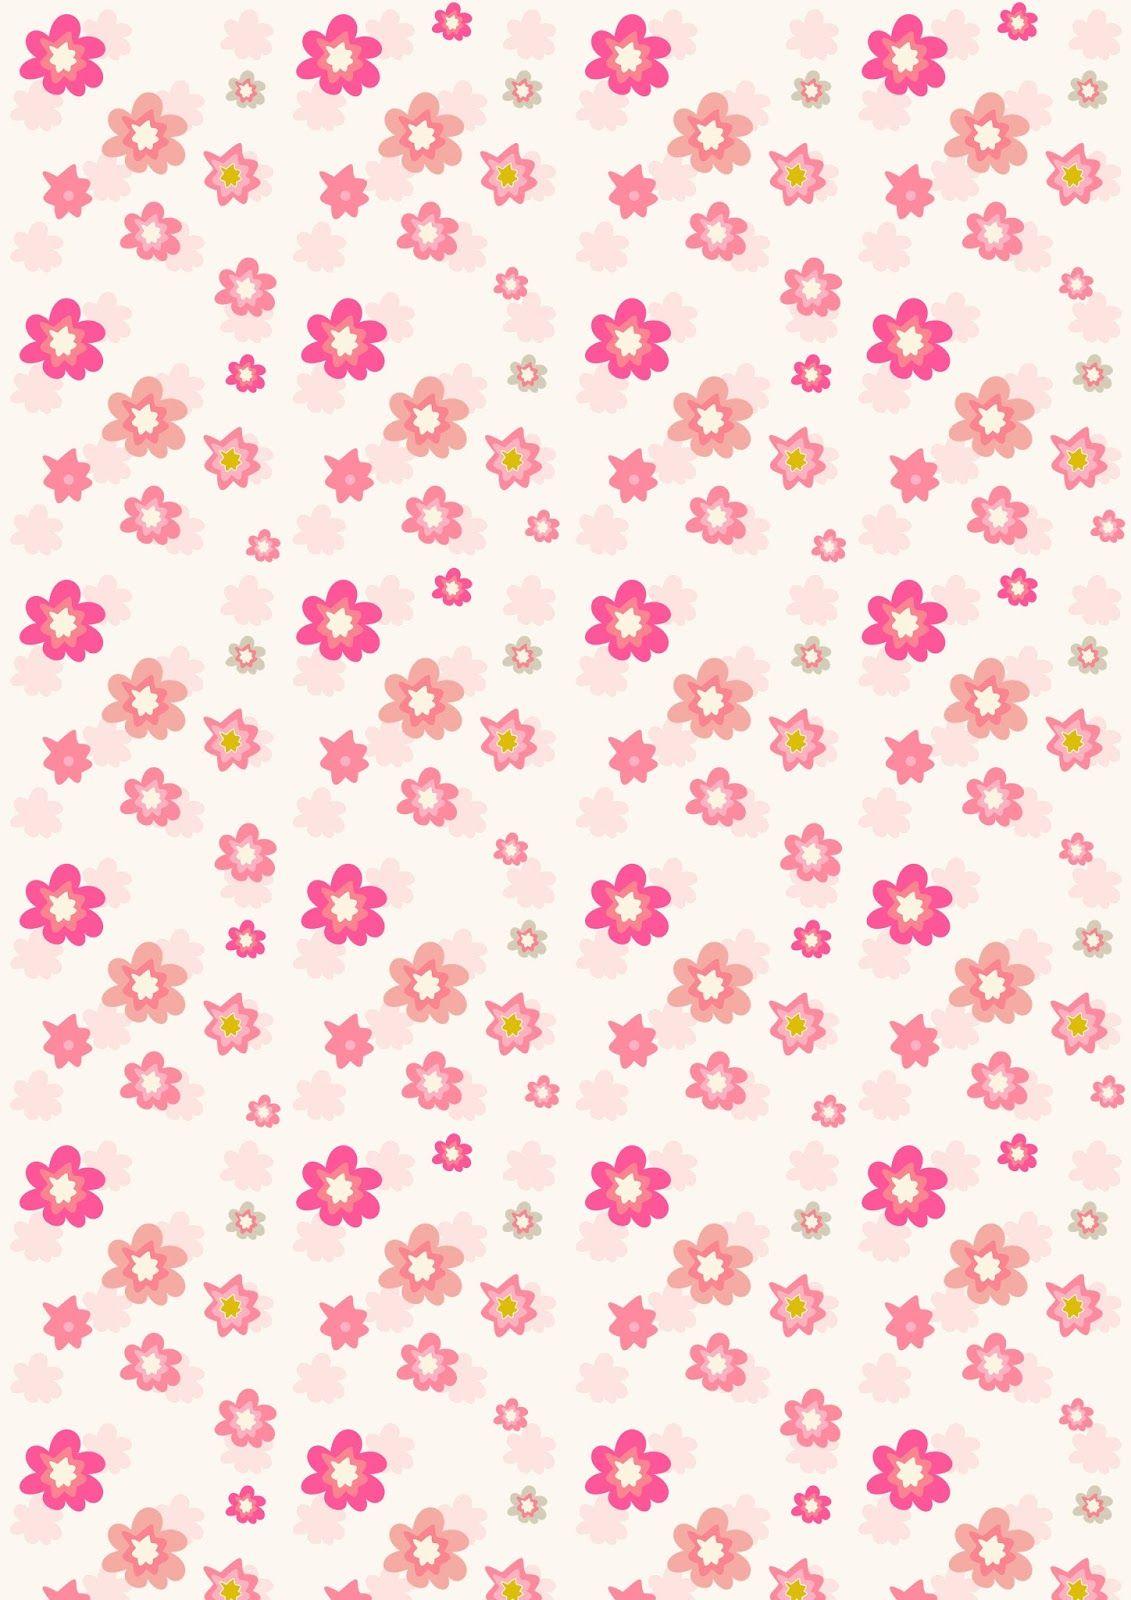 Free Digital Floral Scrapbooking Paper In Pink Ausdruckbares